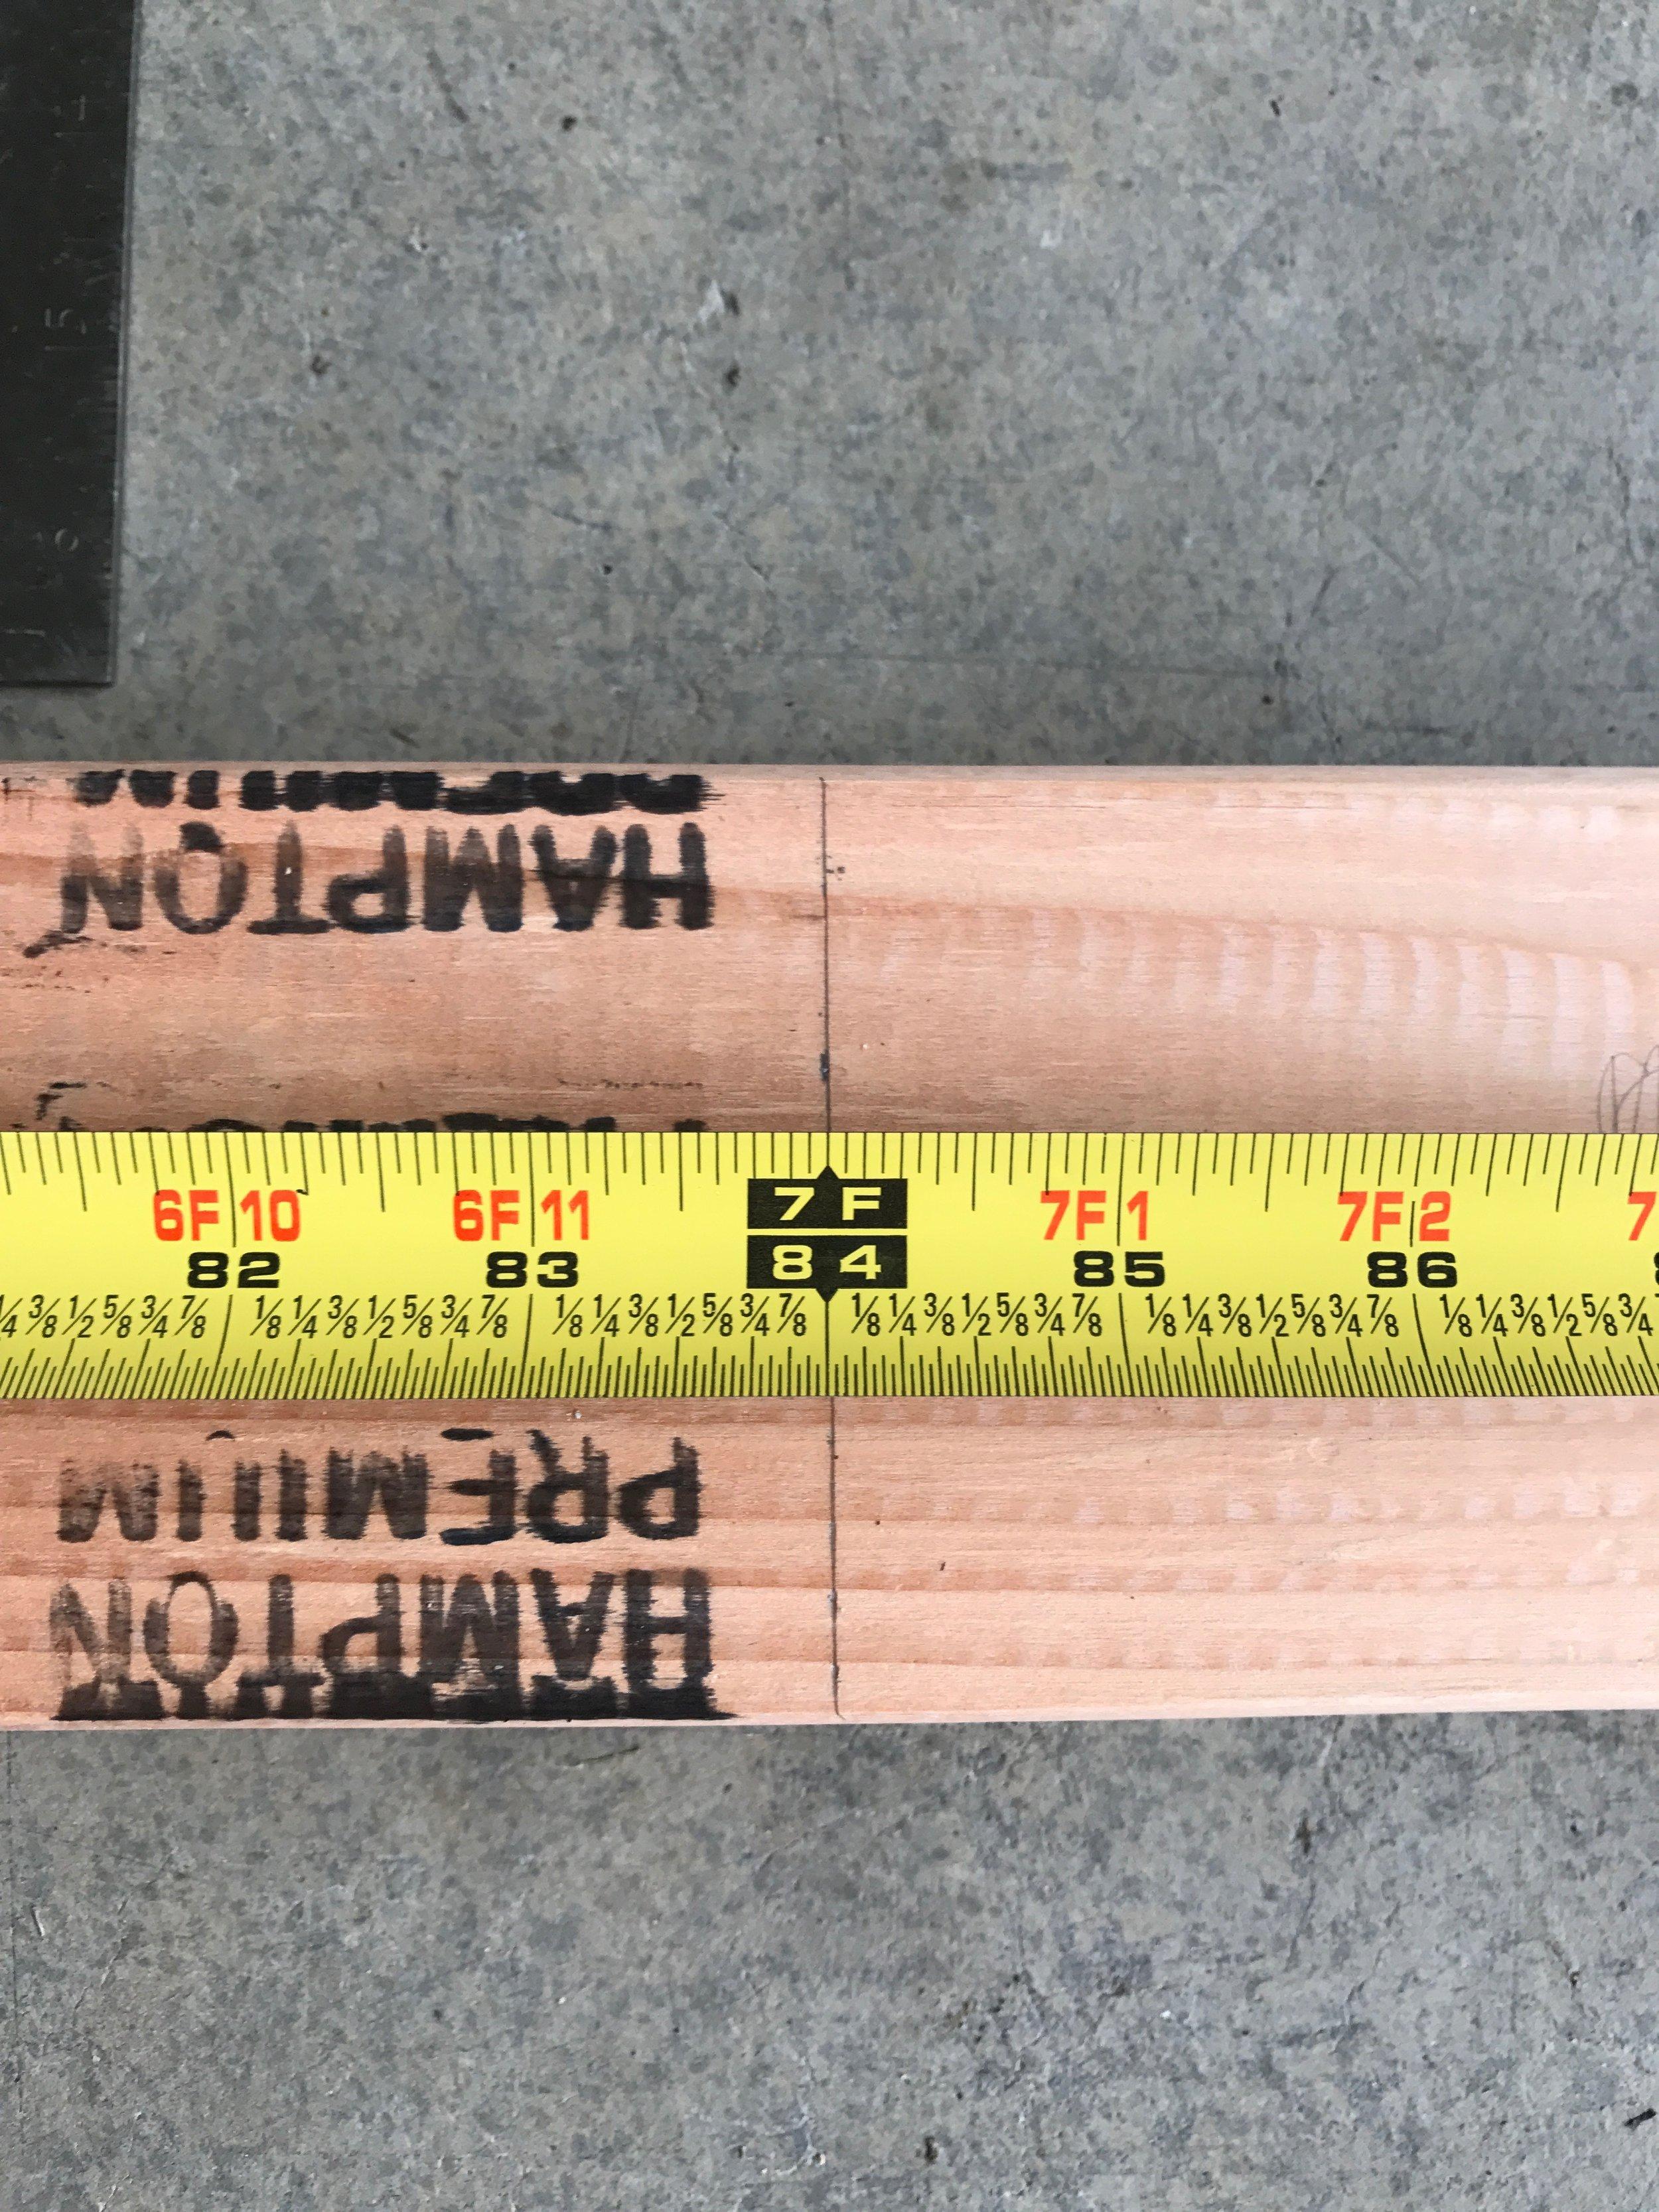 - 20in on tape measure from bottom mark it! 31 1/2 in on tape measure mark it! 43in on tape measure mark it! 54 1/2 inch on tape measure mark it! 66in on tape measure mark it!